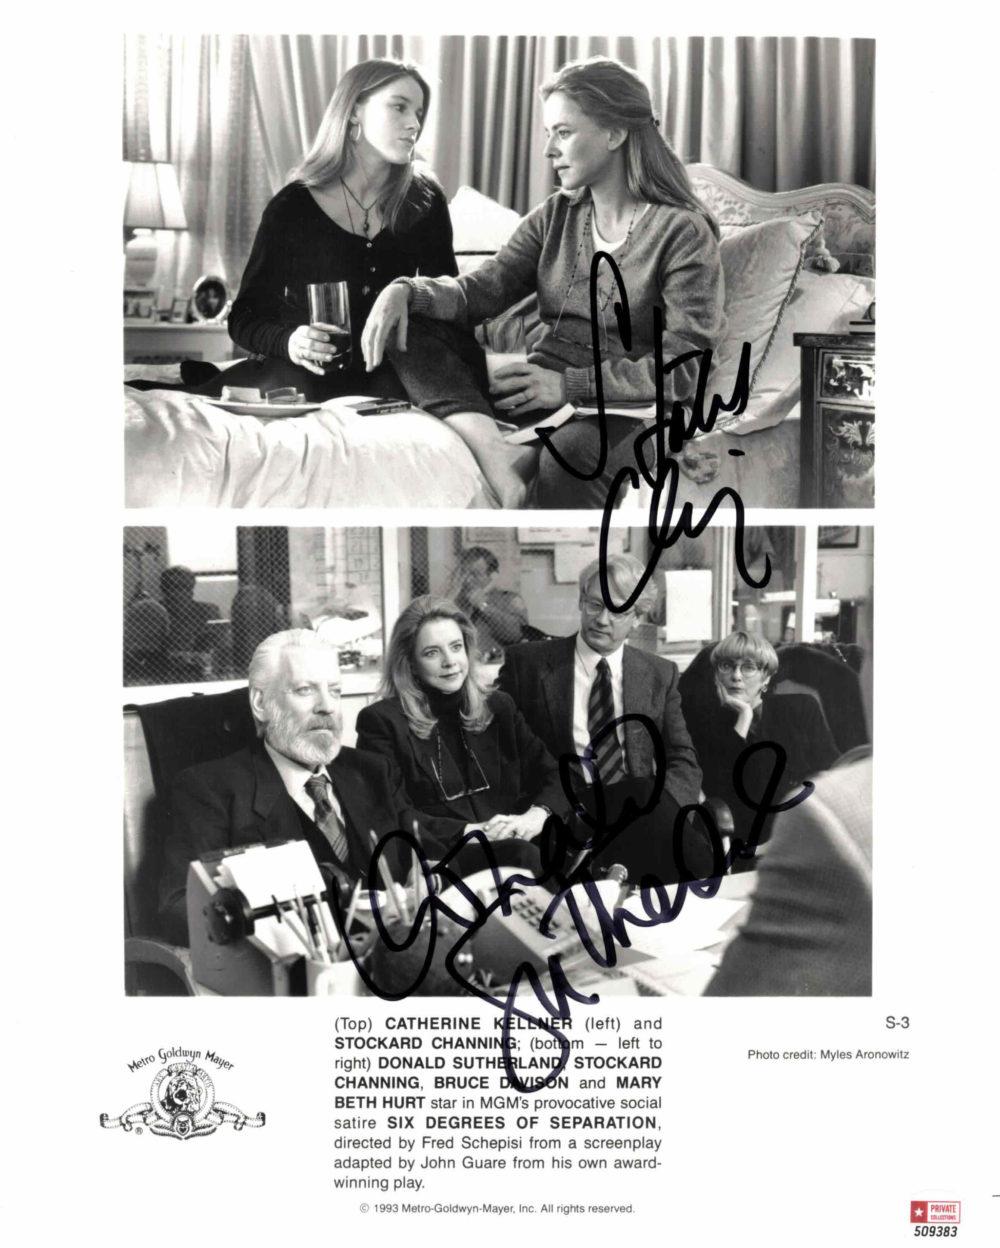 Donald Sutherland & Stockard Channing - autogram